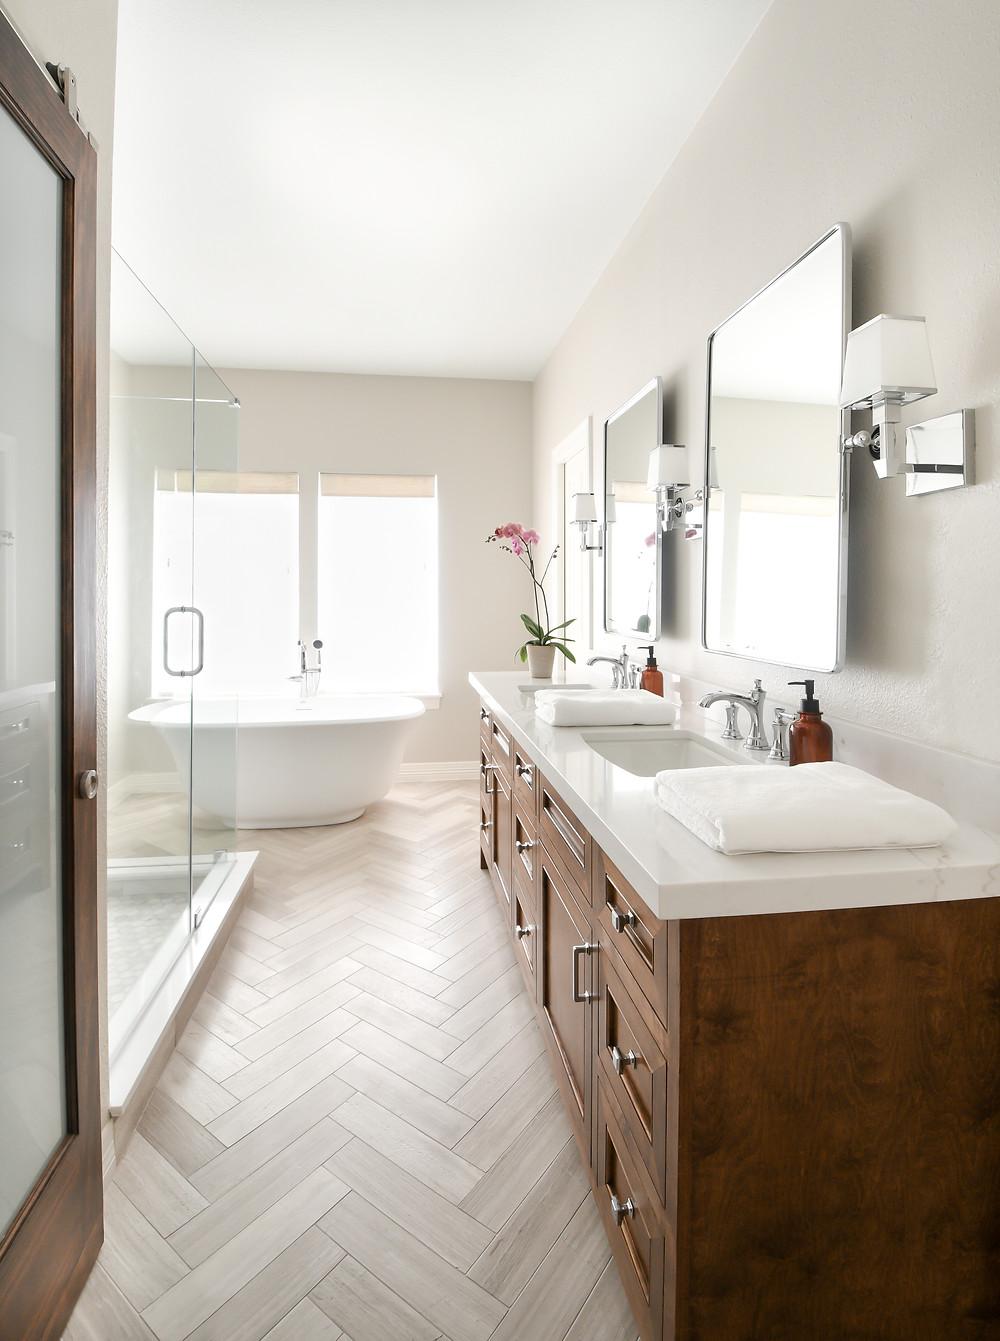 Modern transitional primary bathroom retreat by Houston interior design firm Nancy Lane Interiors.